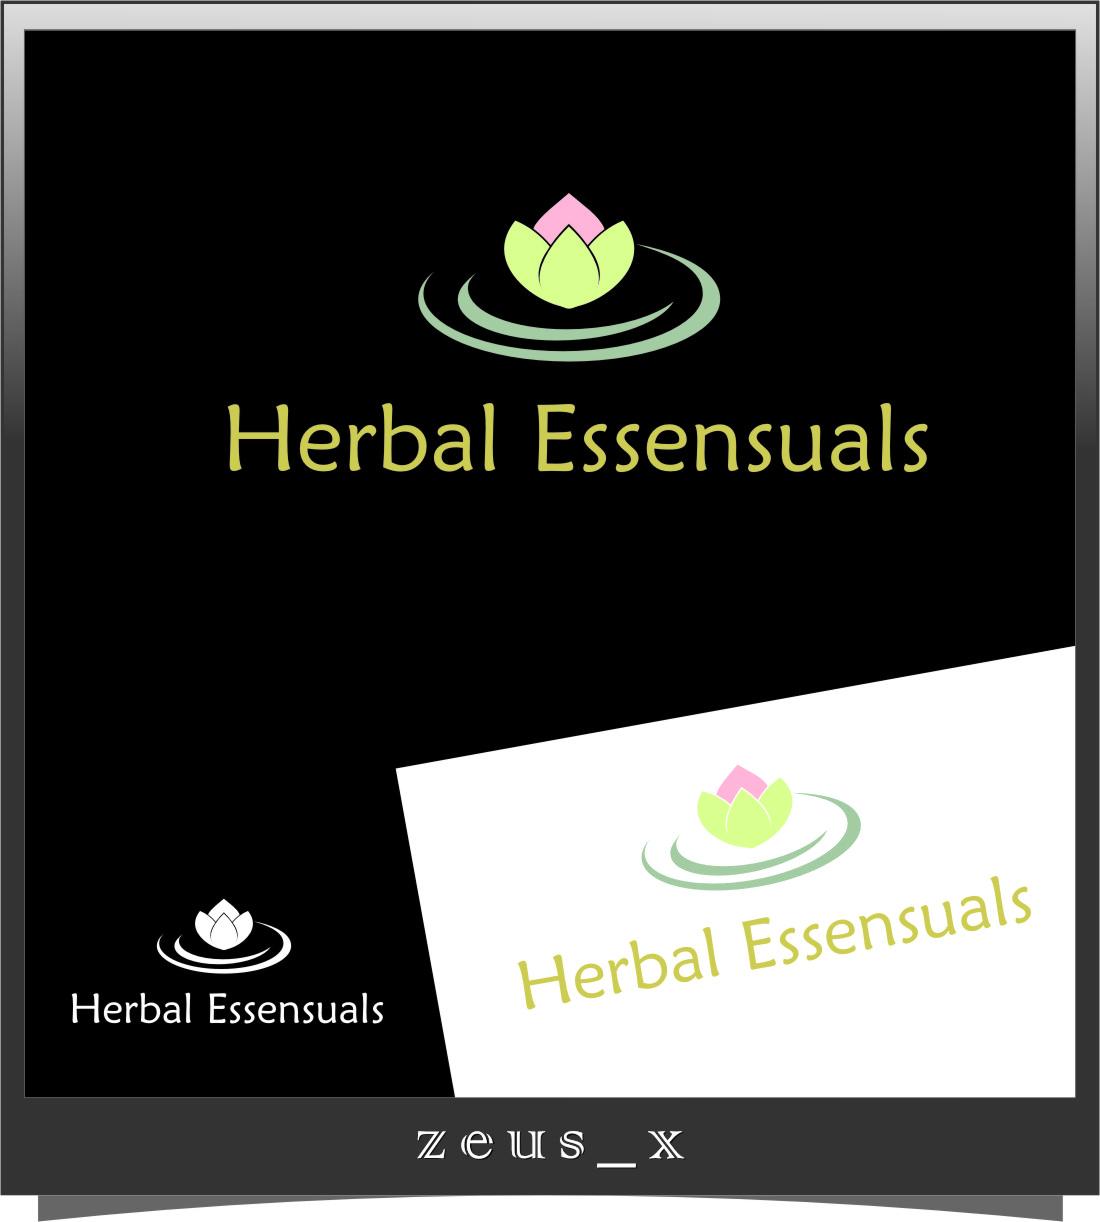 Logo Design by Ngepet_art - Entry No. 99 in the Logo Design Contest Captivating Logo Design for Herbal Essensuals.